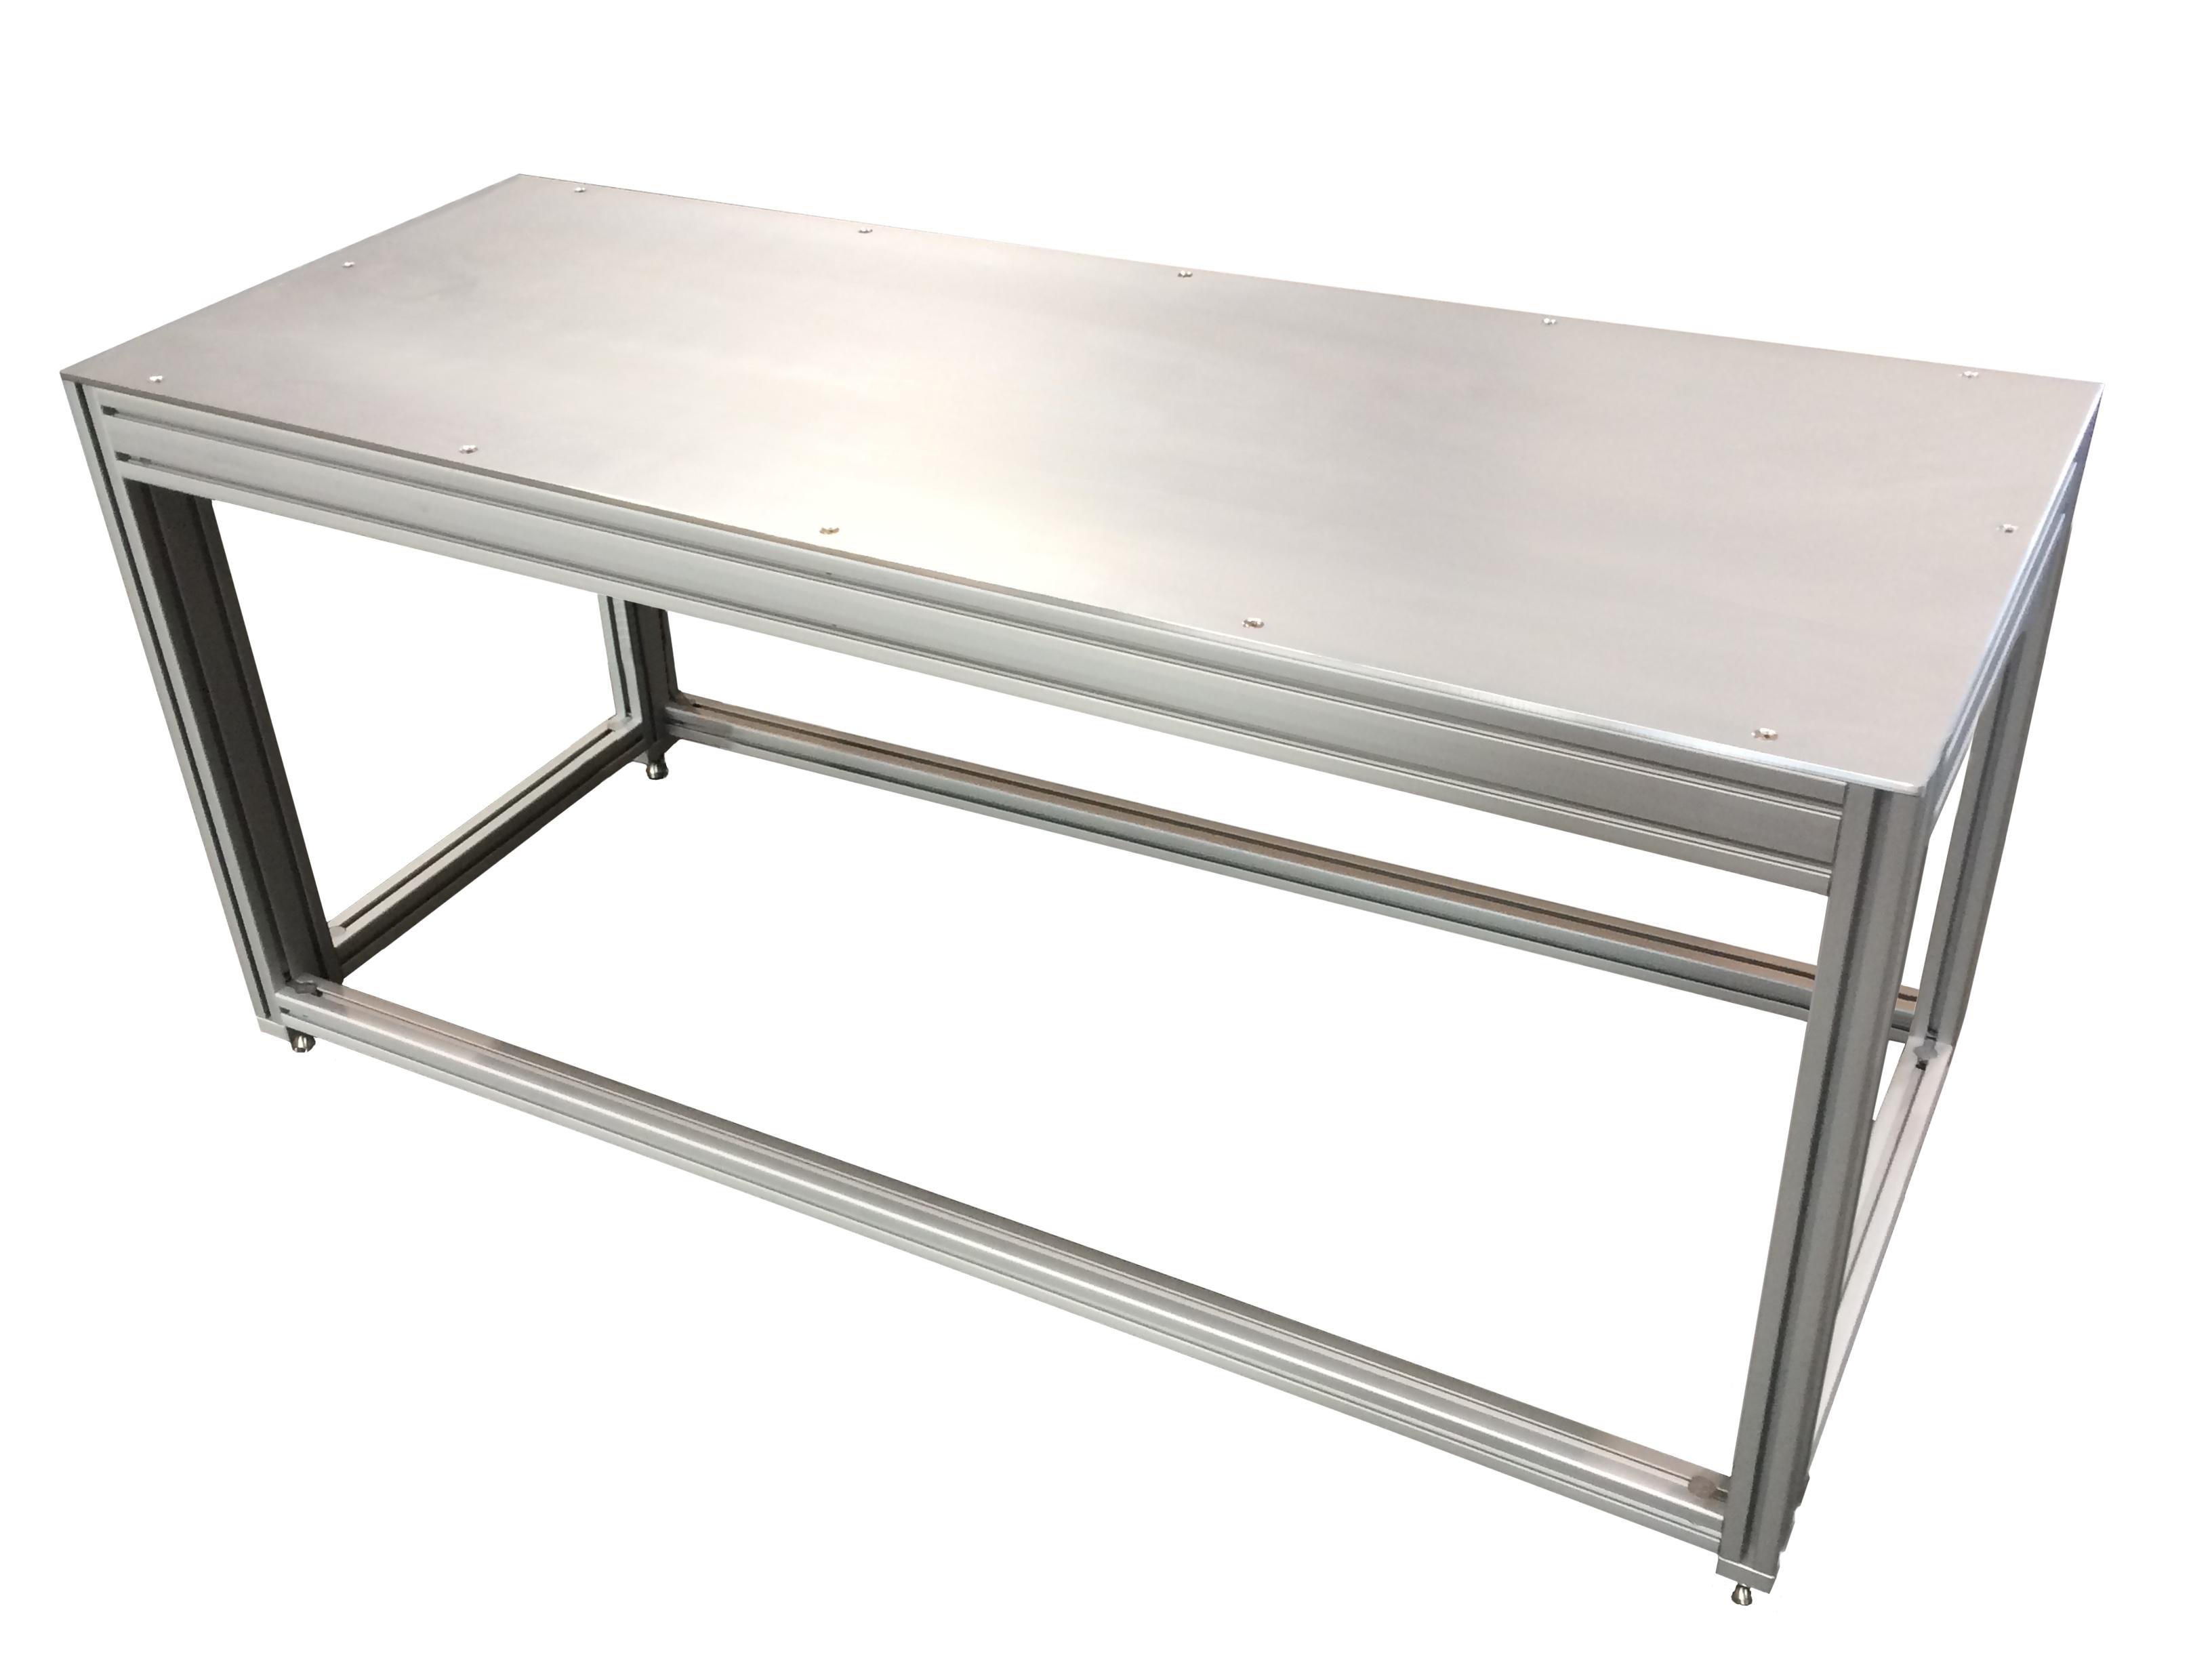 8020 Inc T Slotted Aluminum Framing System | sokolvineyard.com